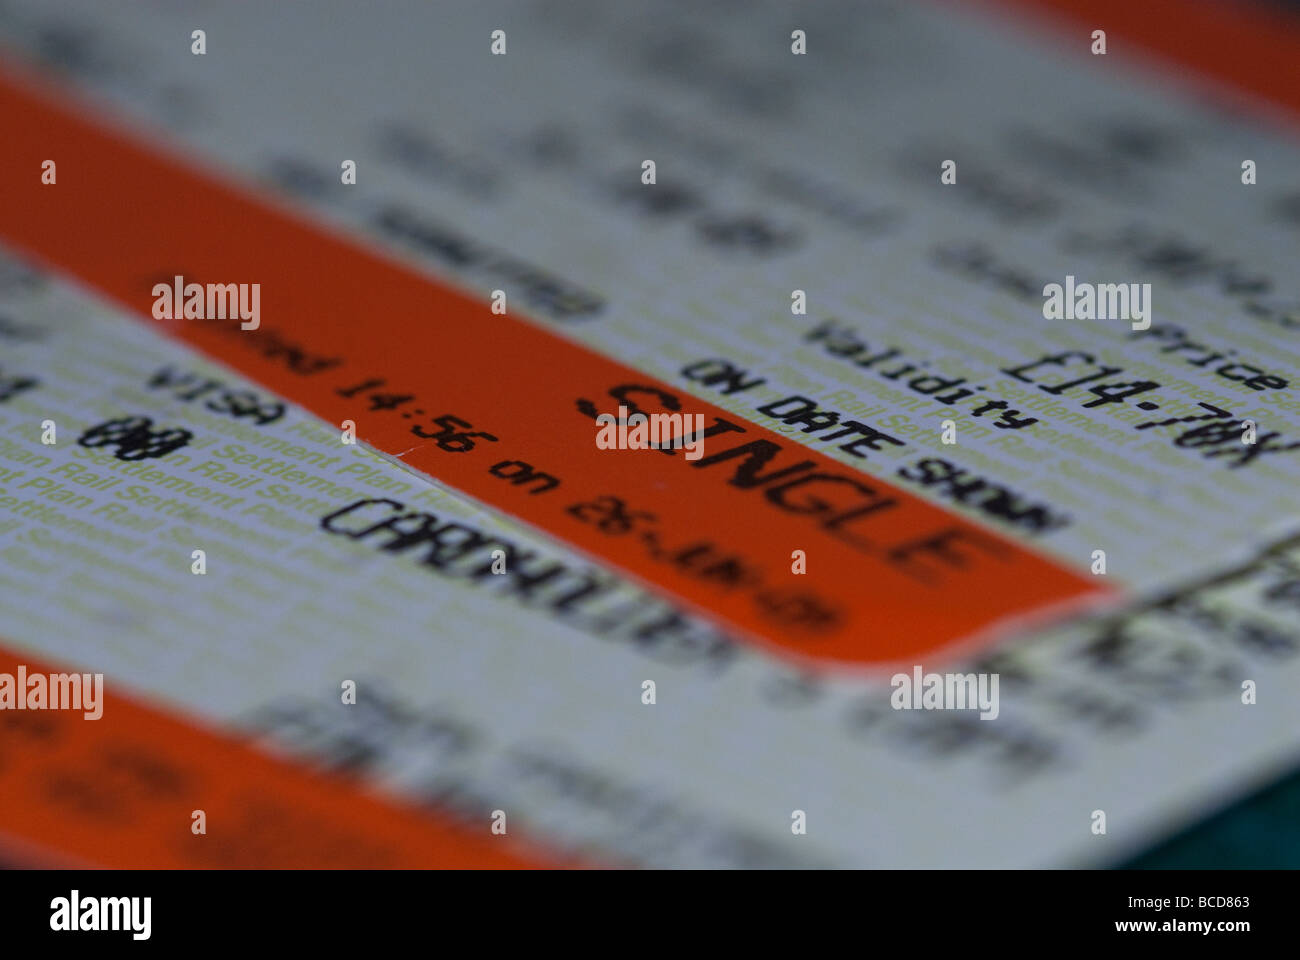 Rail Ticket Close-up - Stock Image